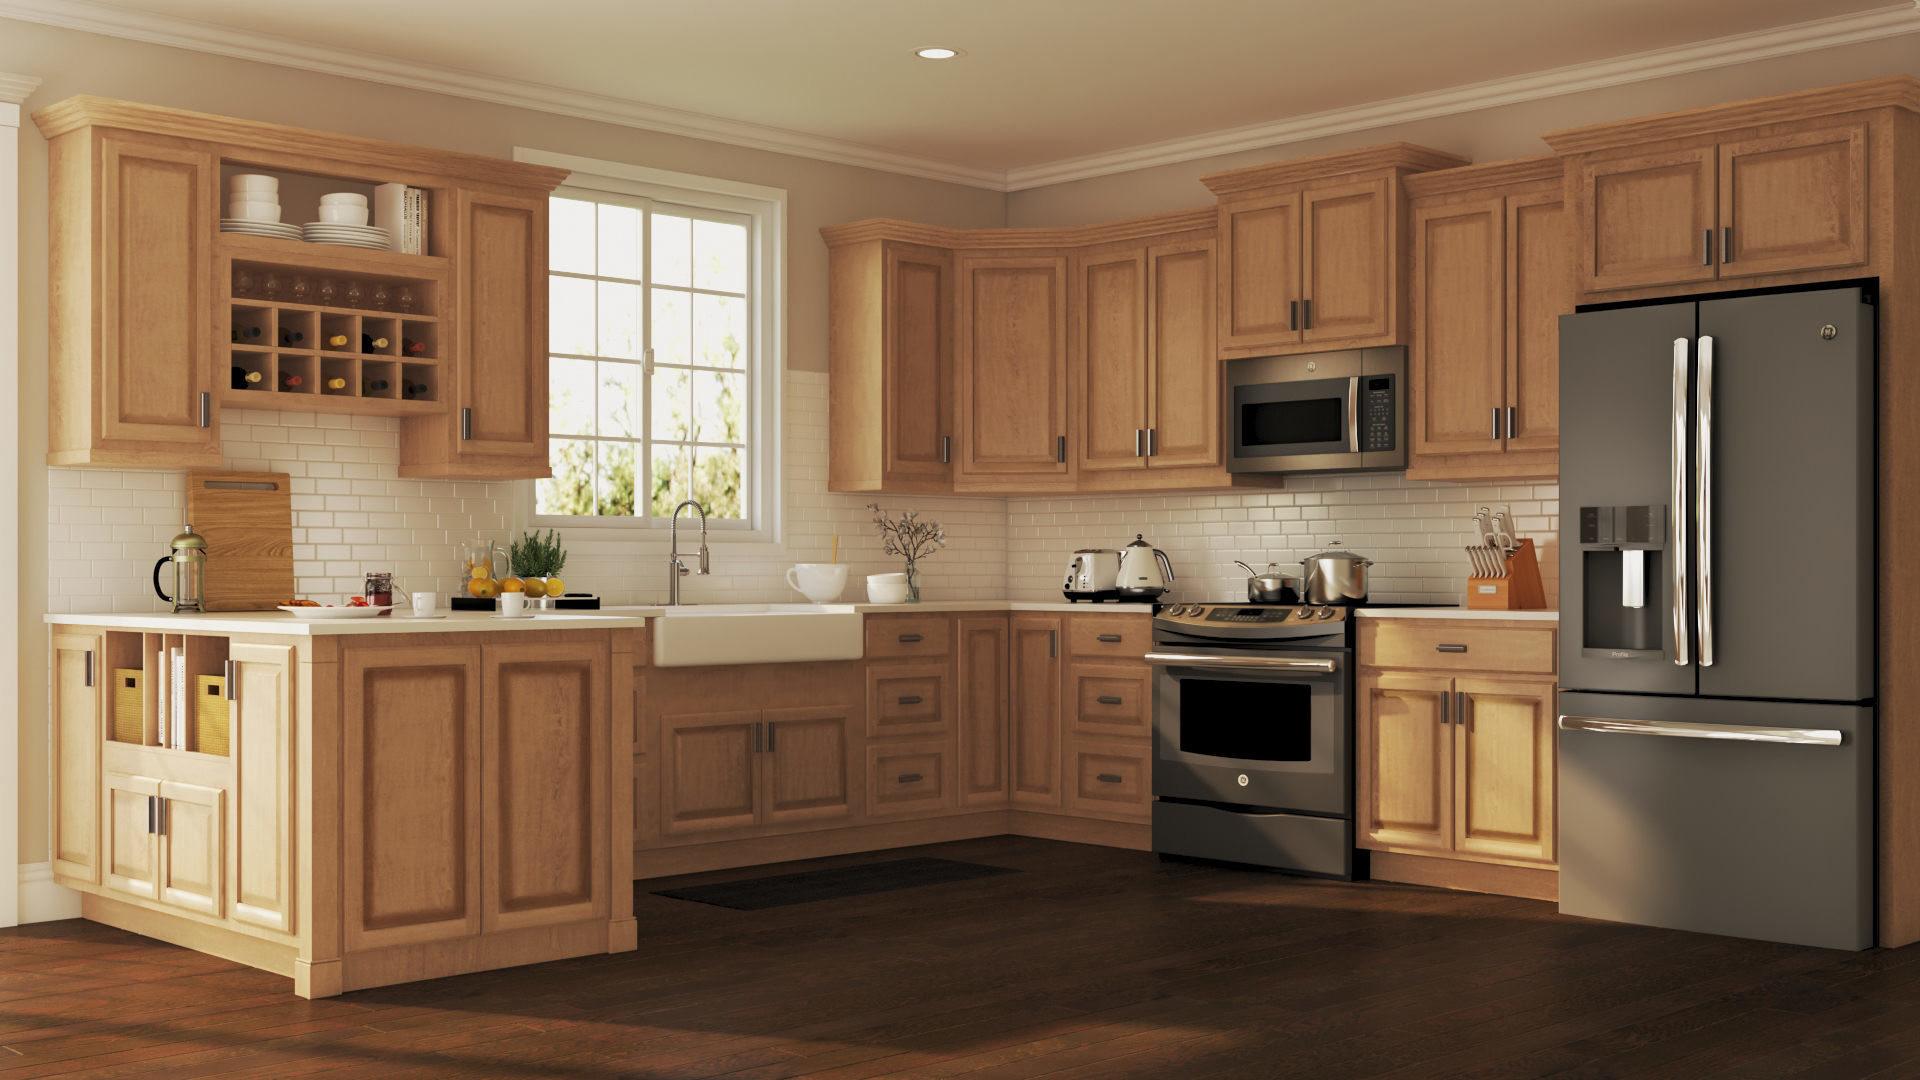 Wall Cabinet Kitchen  Hampton Wall Kitchen Cabinets in Medium Oak – Kitchen